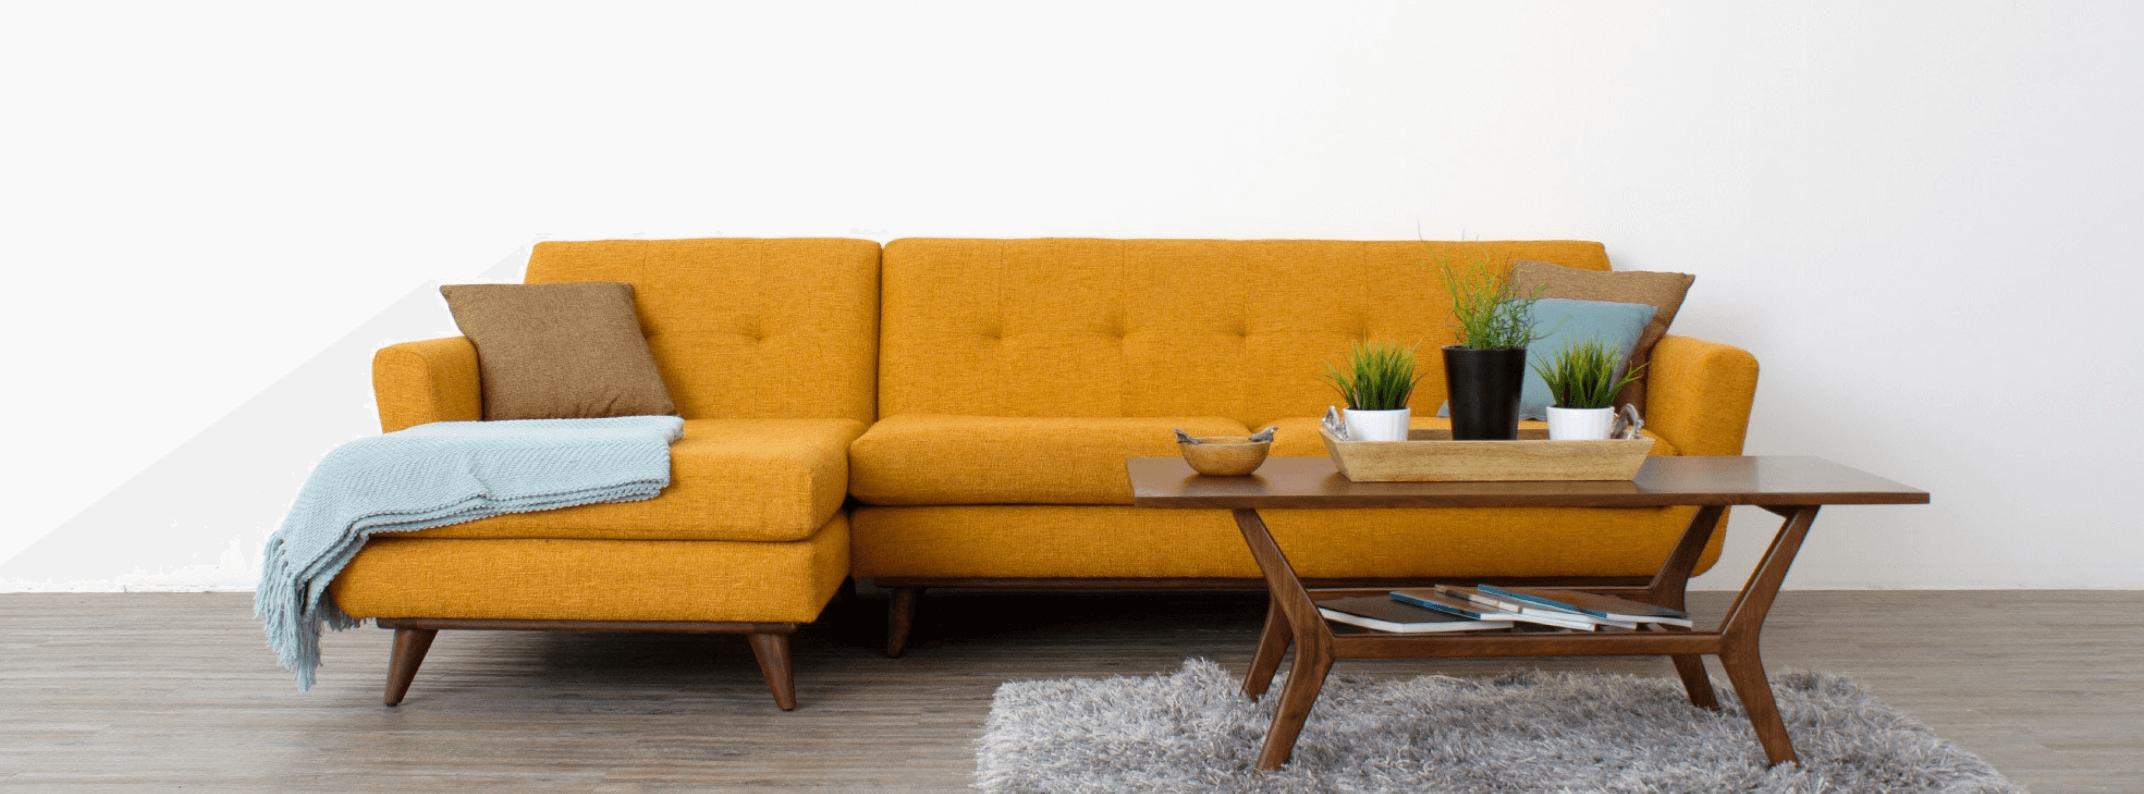 Hughes Sofa Joybird Midcentury Small Apartment .png